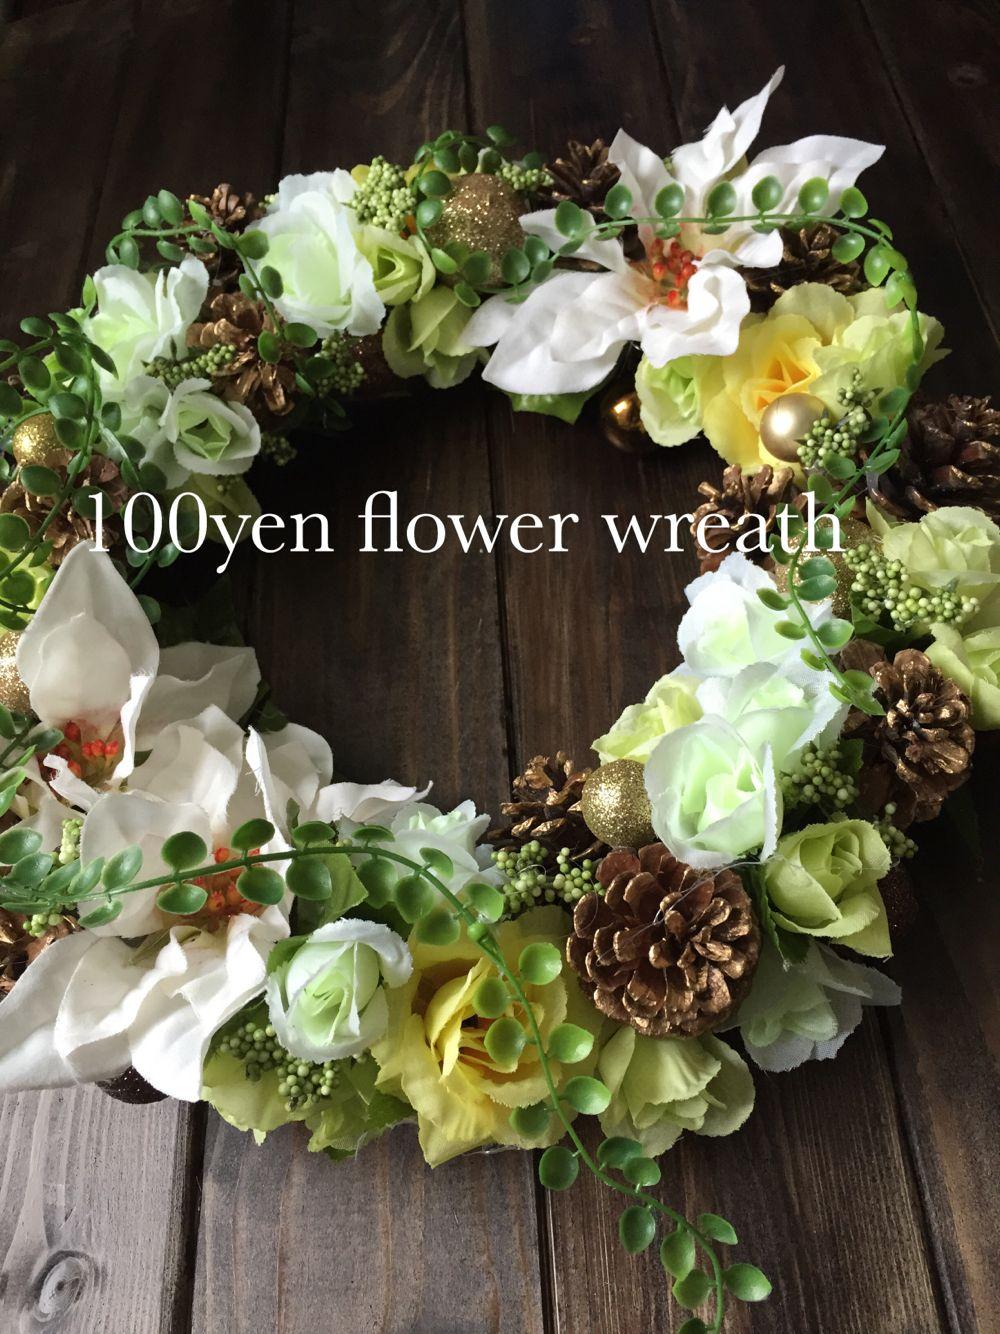 64a21feefe 全て100均ダイソーの造花で作りました♡ シルクフラワーアレンジメント, 造花